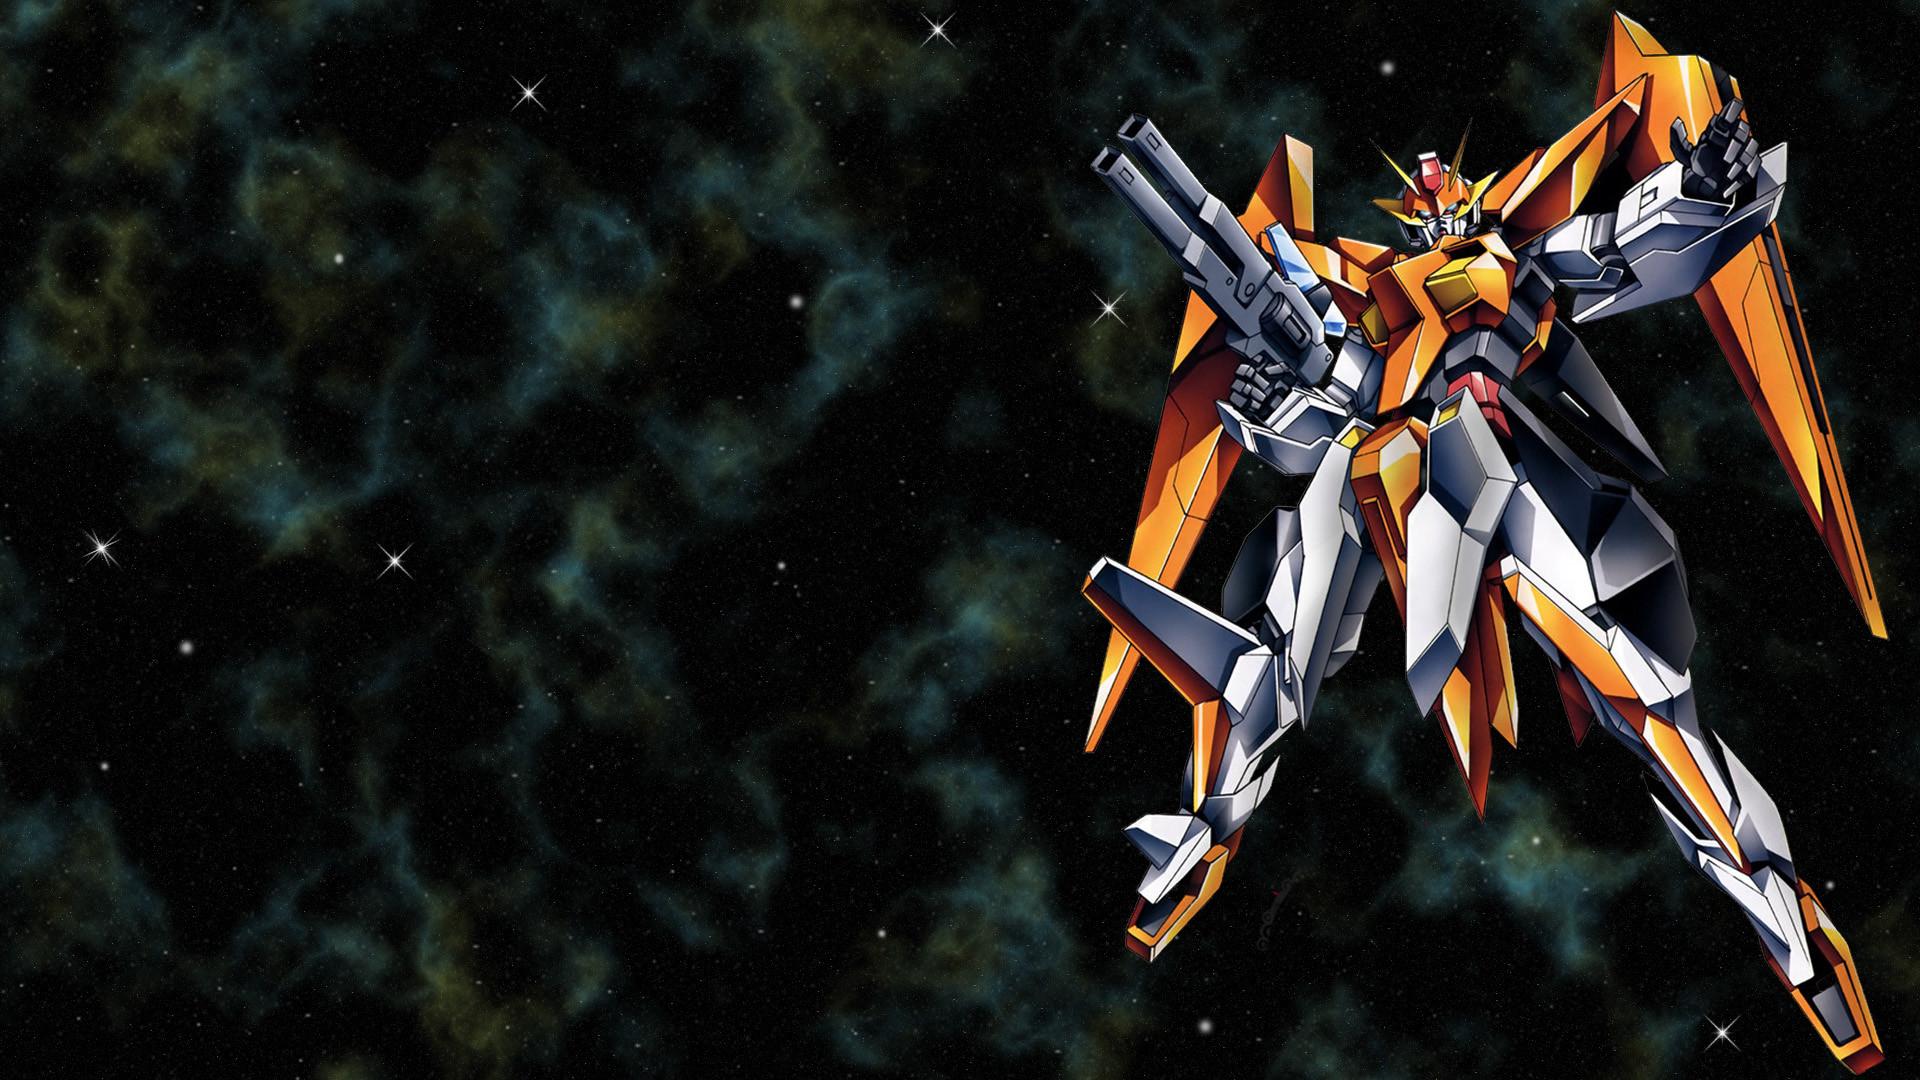 View Fullsize GN-007 Arios Gundam Image